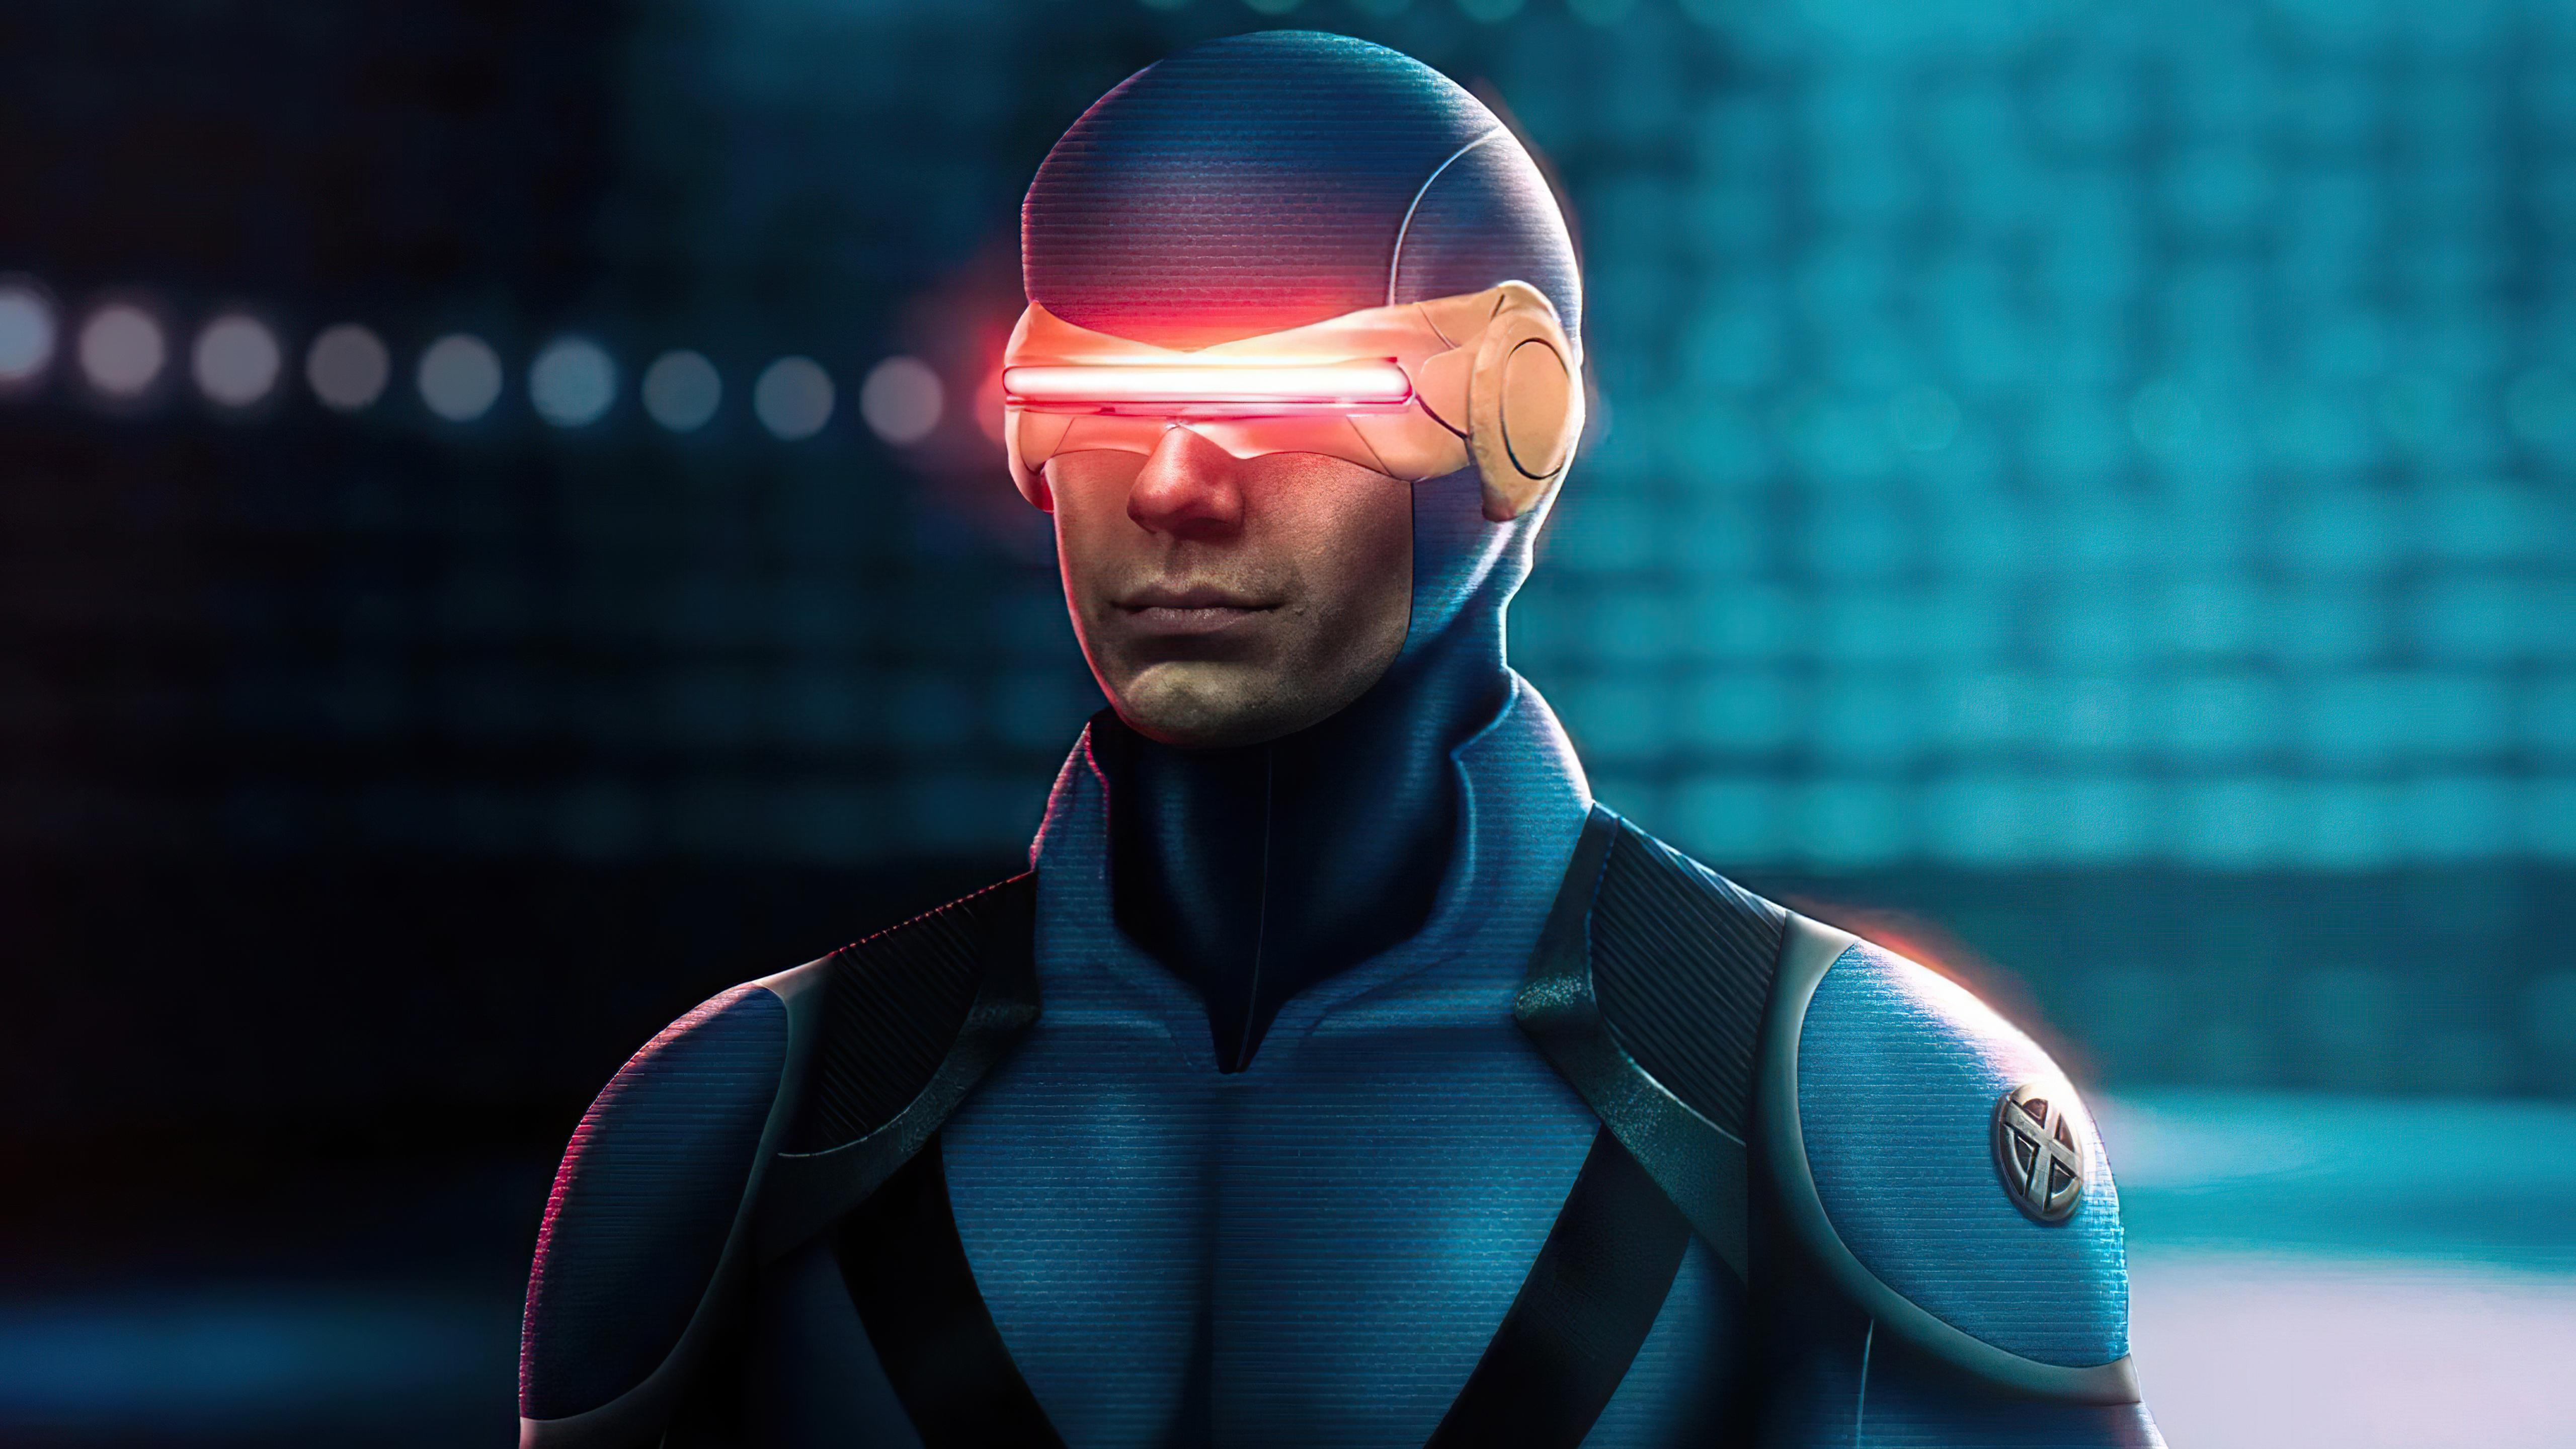 Wallpaper Cyclops in MCU